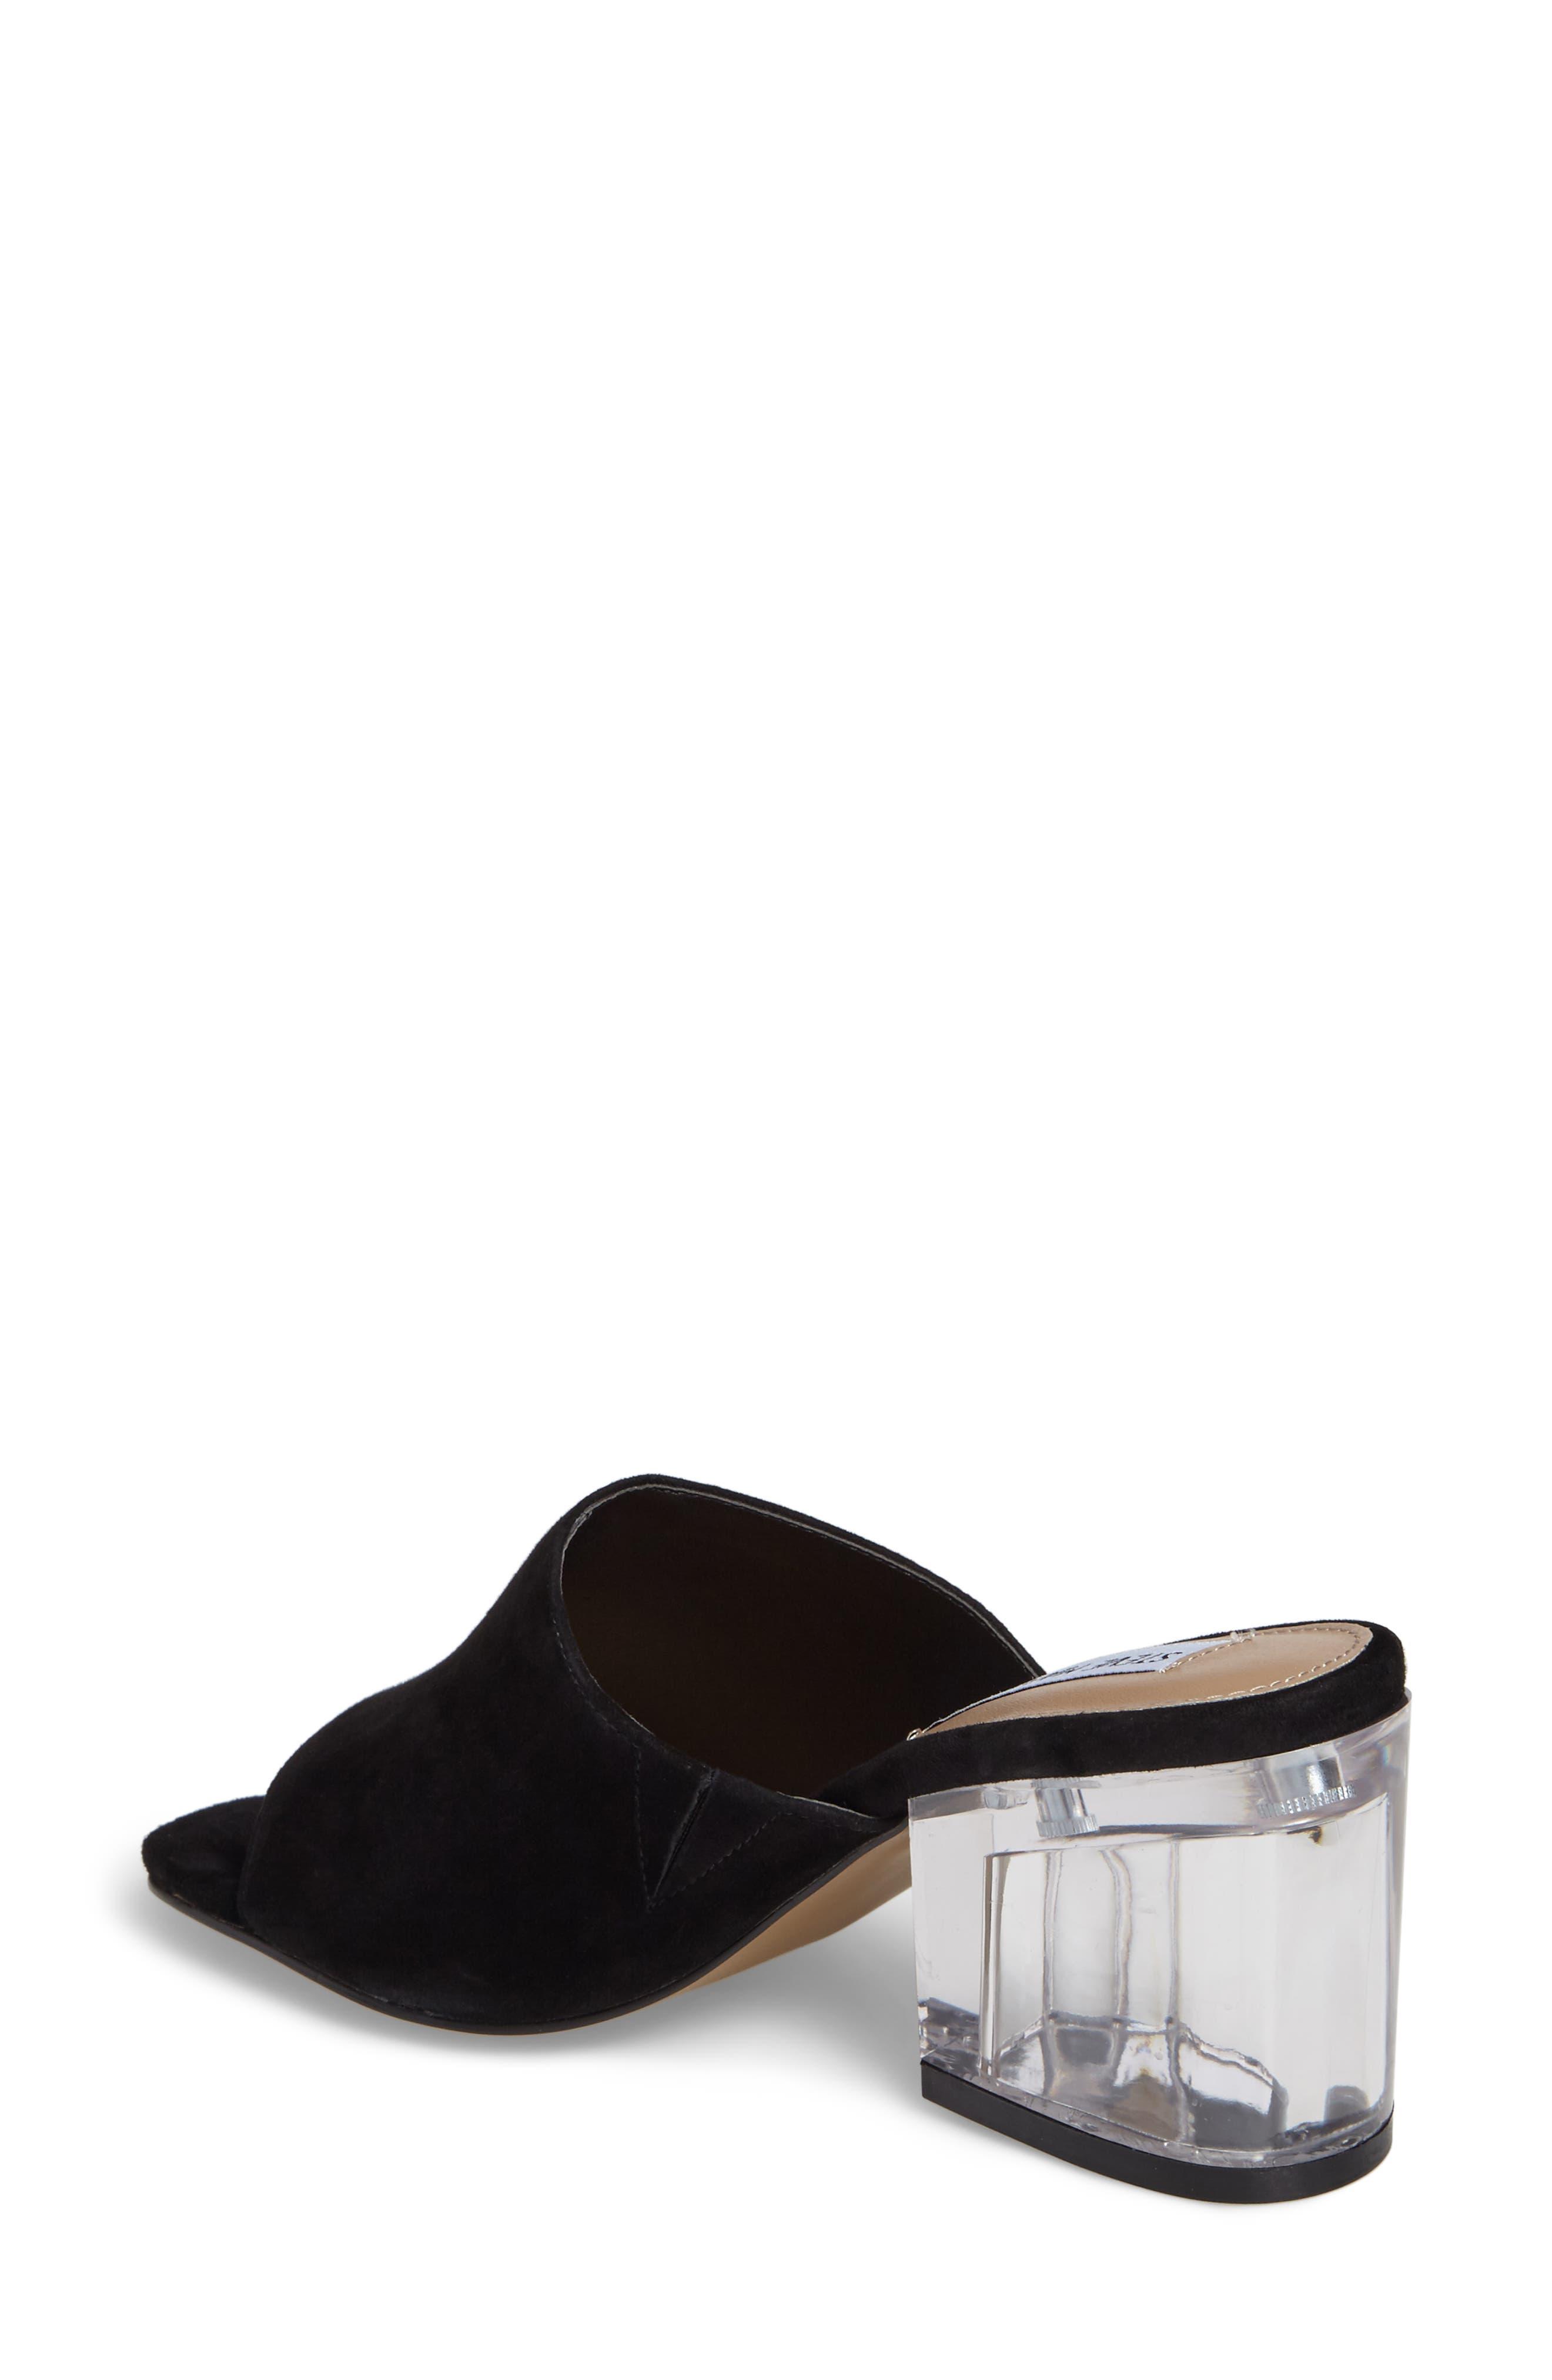 Dalis Clear Heel Slide Sandal,                             Alternate thumbnail 2, color,                             006